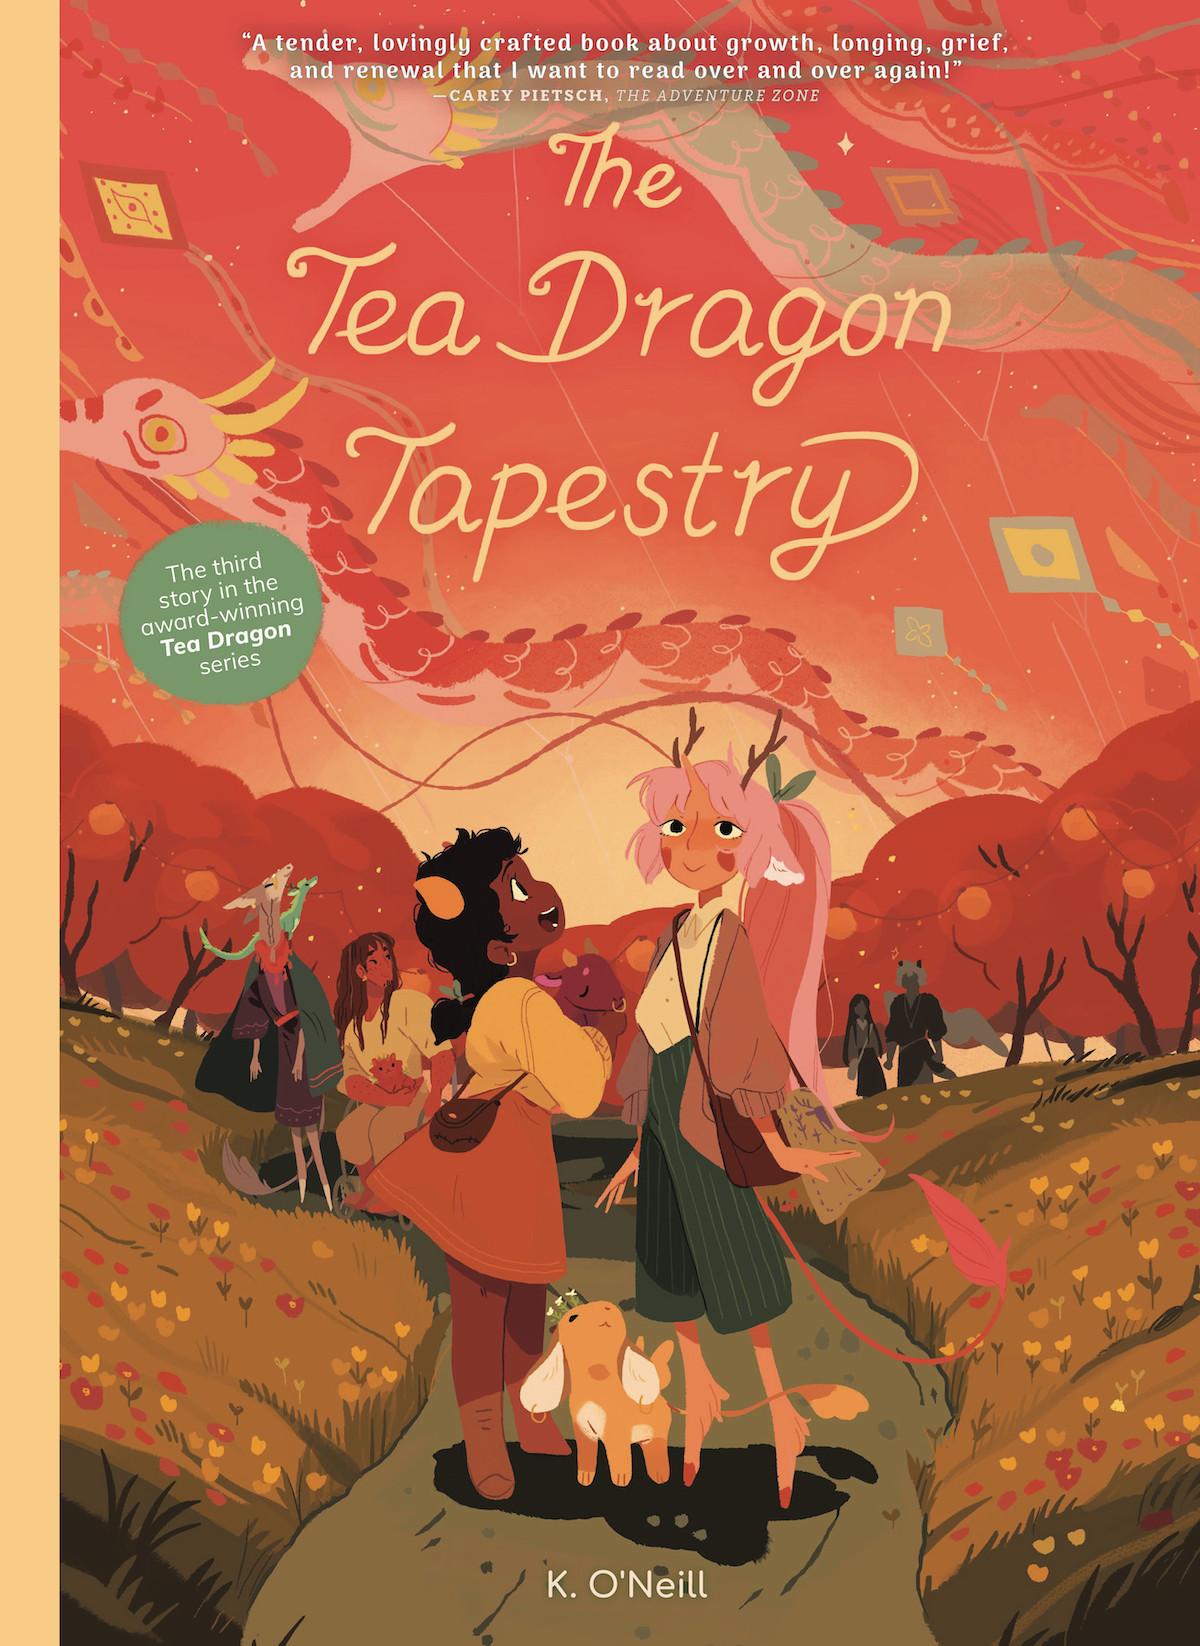 The Tea Dragon Tapestry